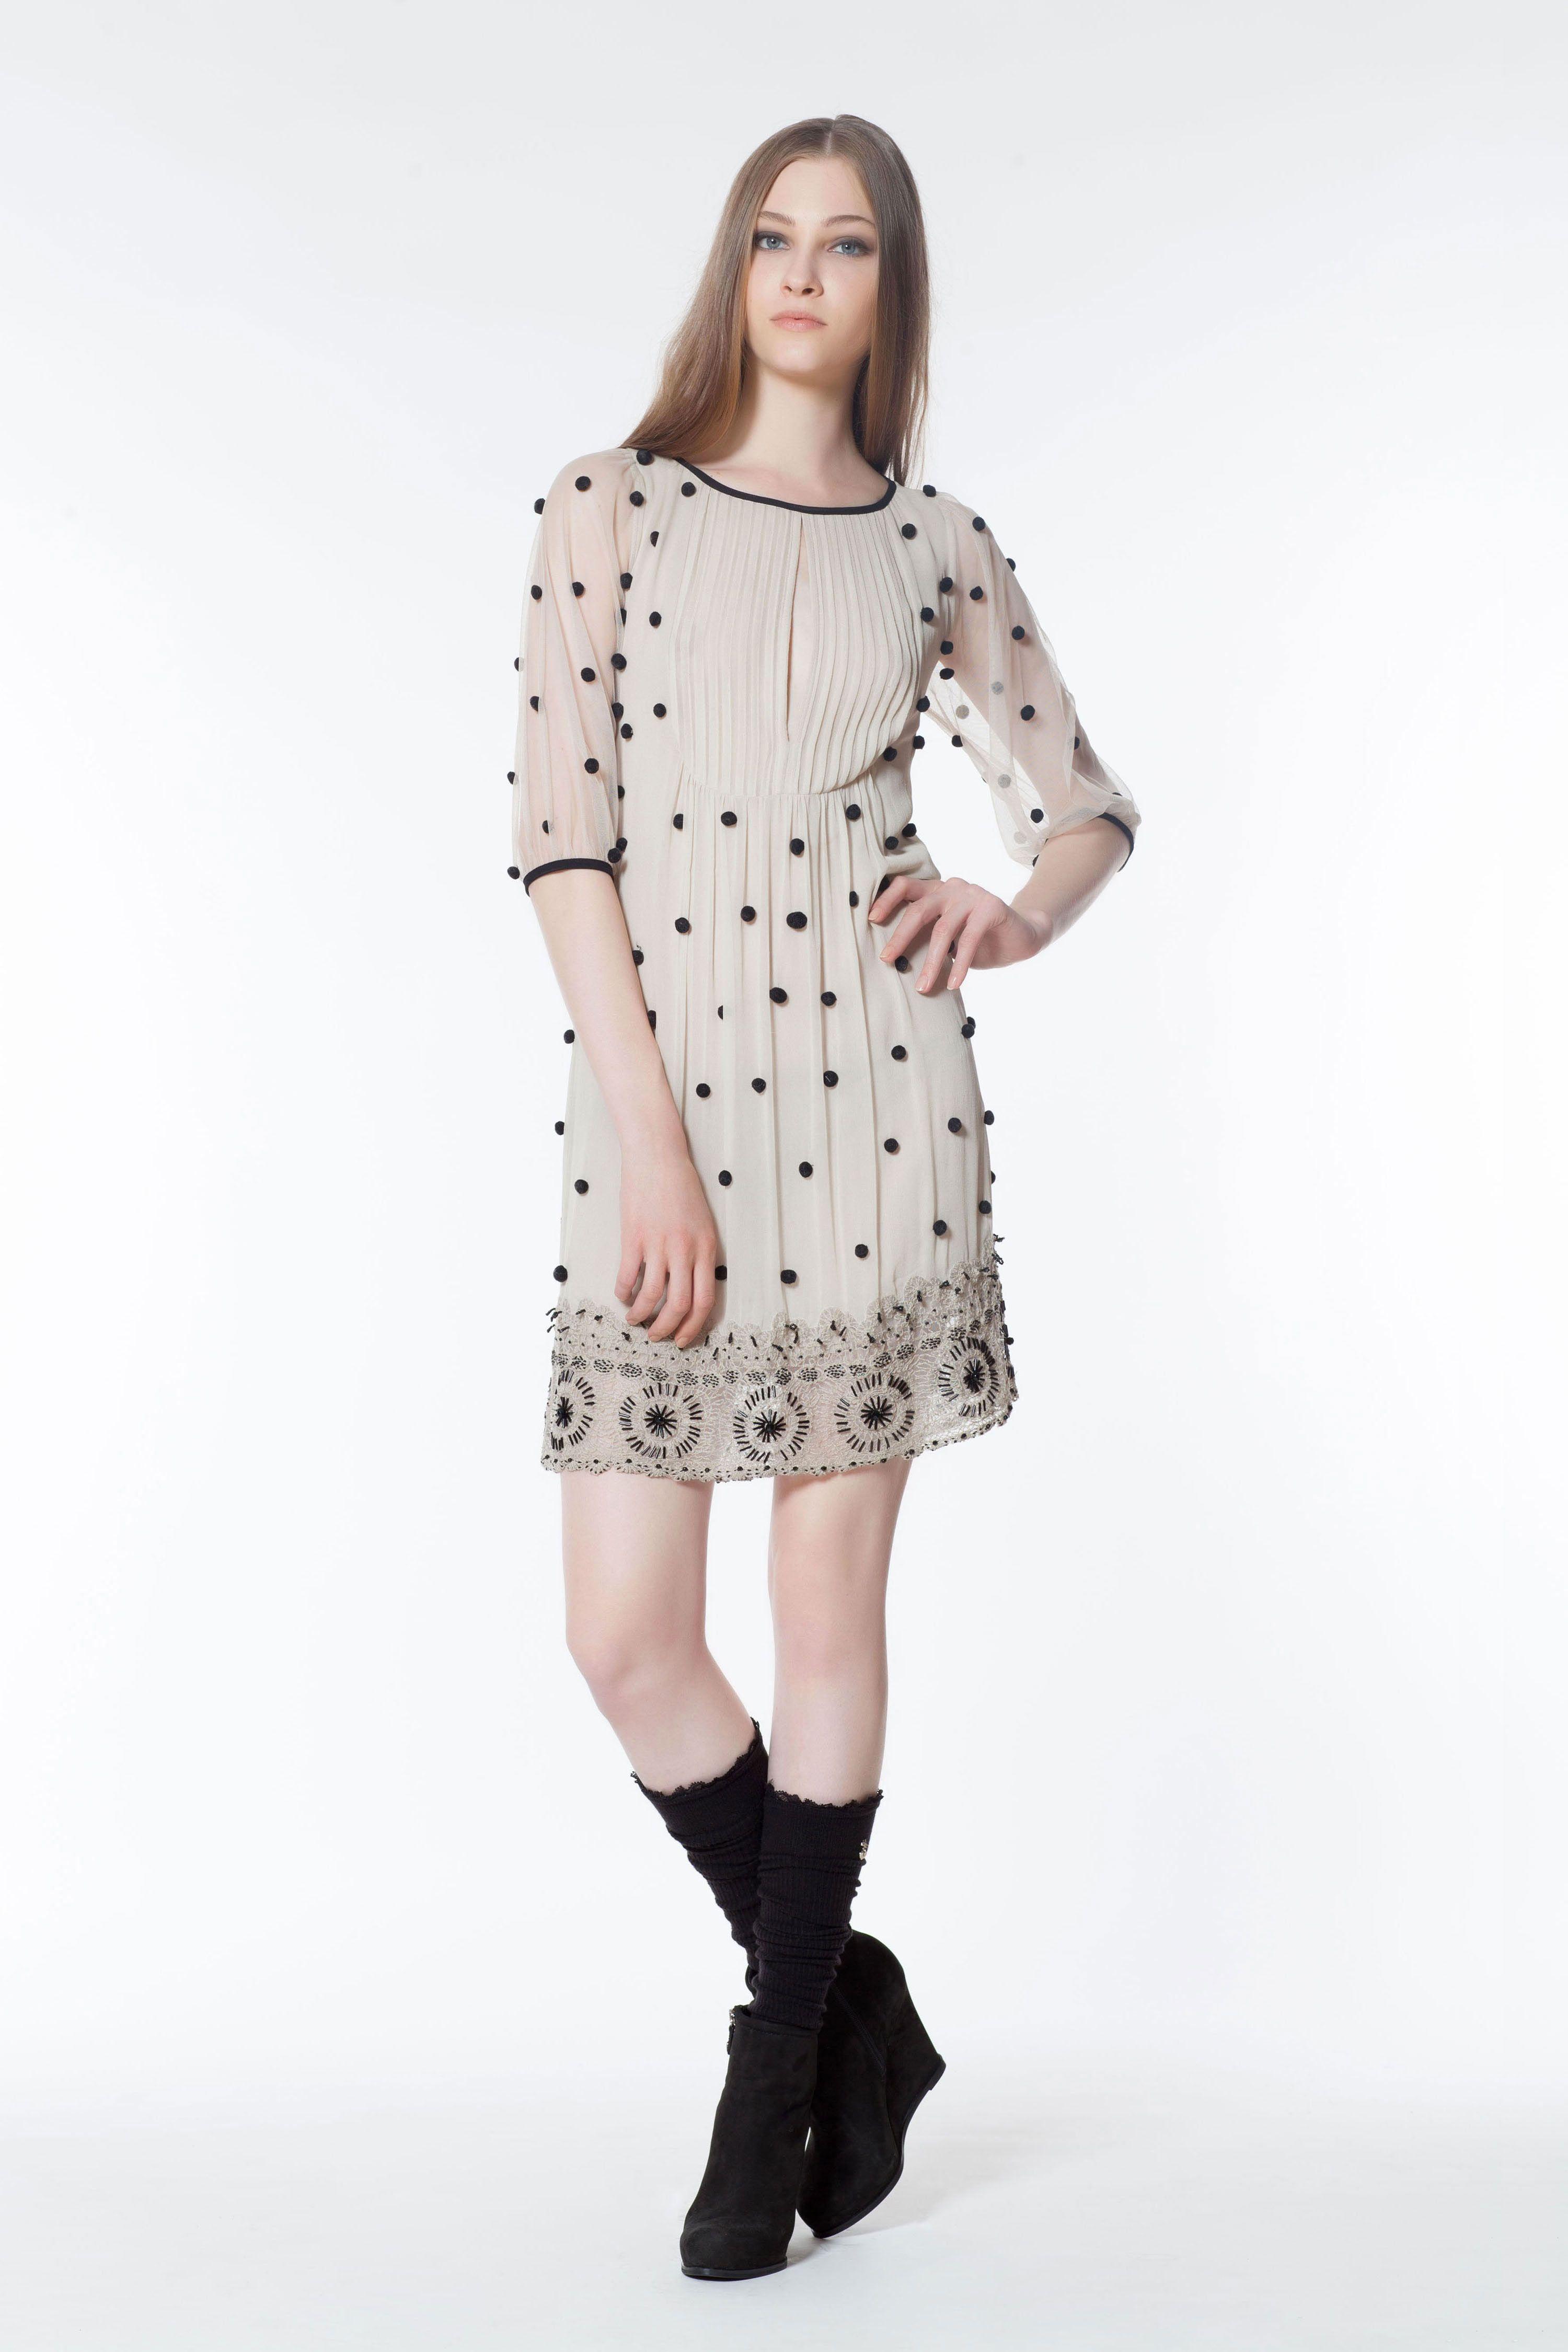 buy online 2f003 a80c0 TWIN-SET Simona Barbieri :: Shop Online - Abiti - Abito ...